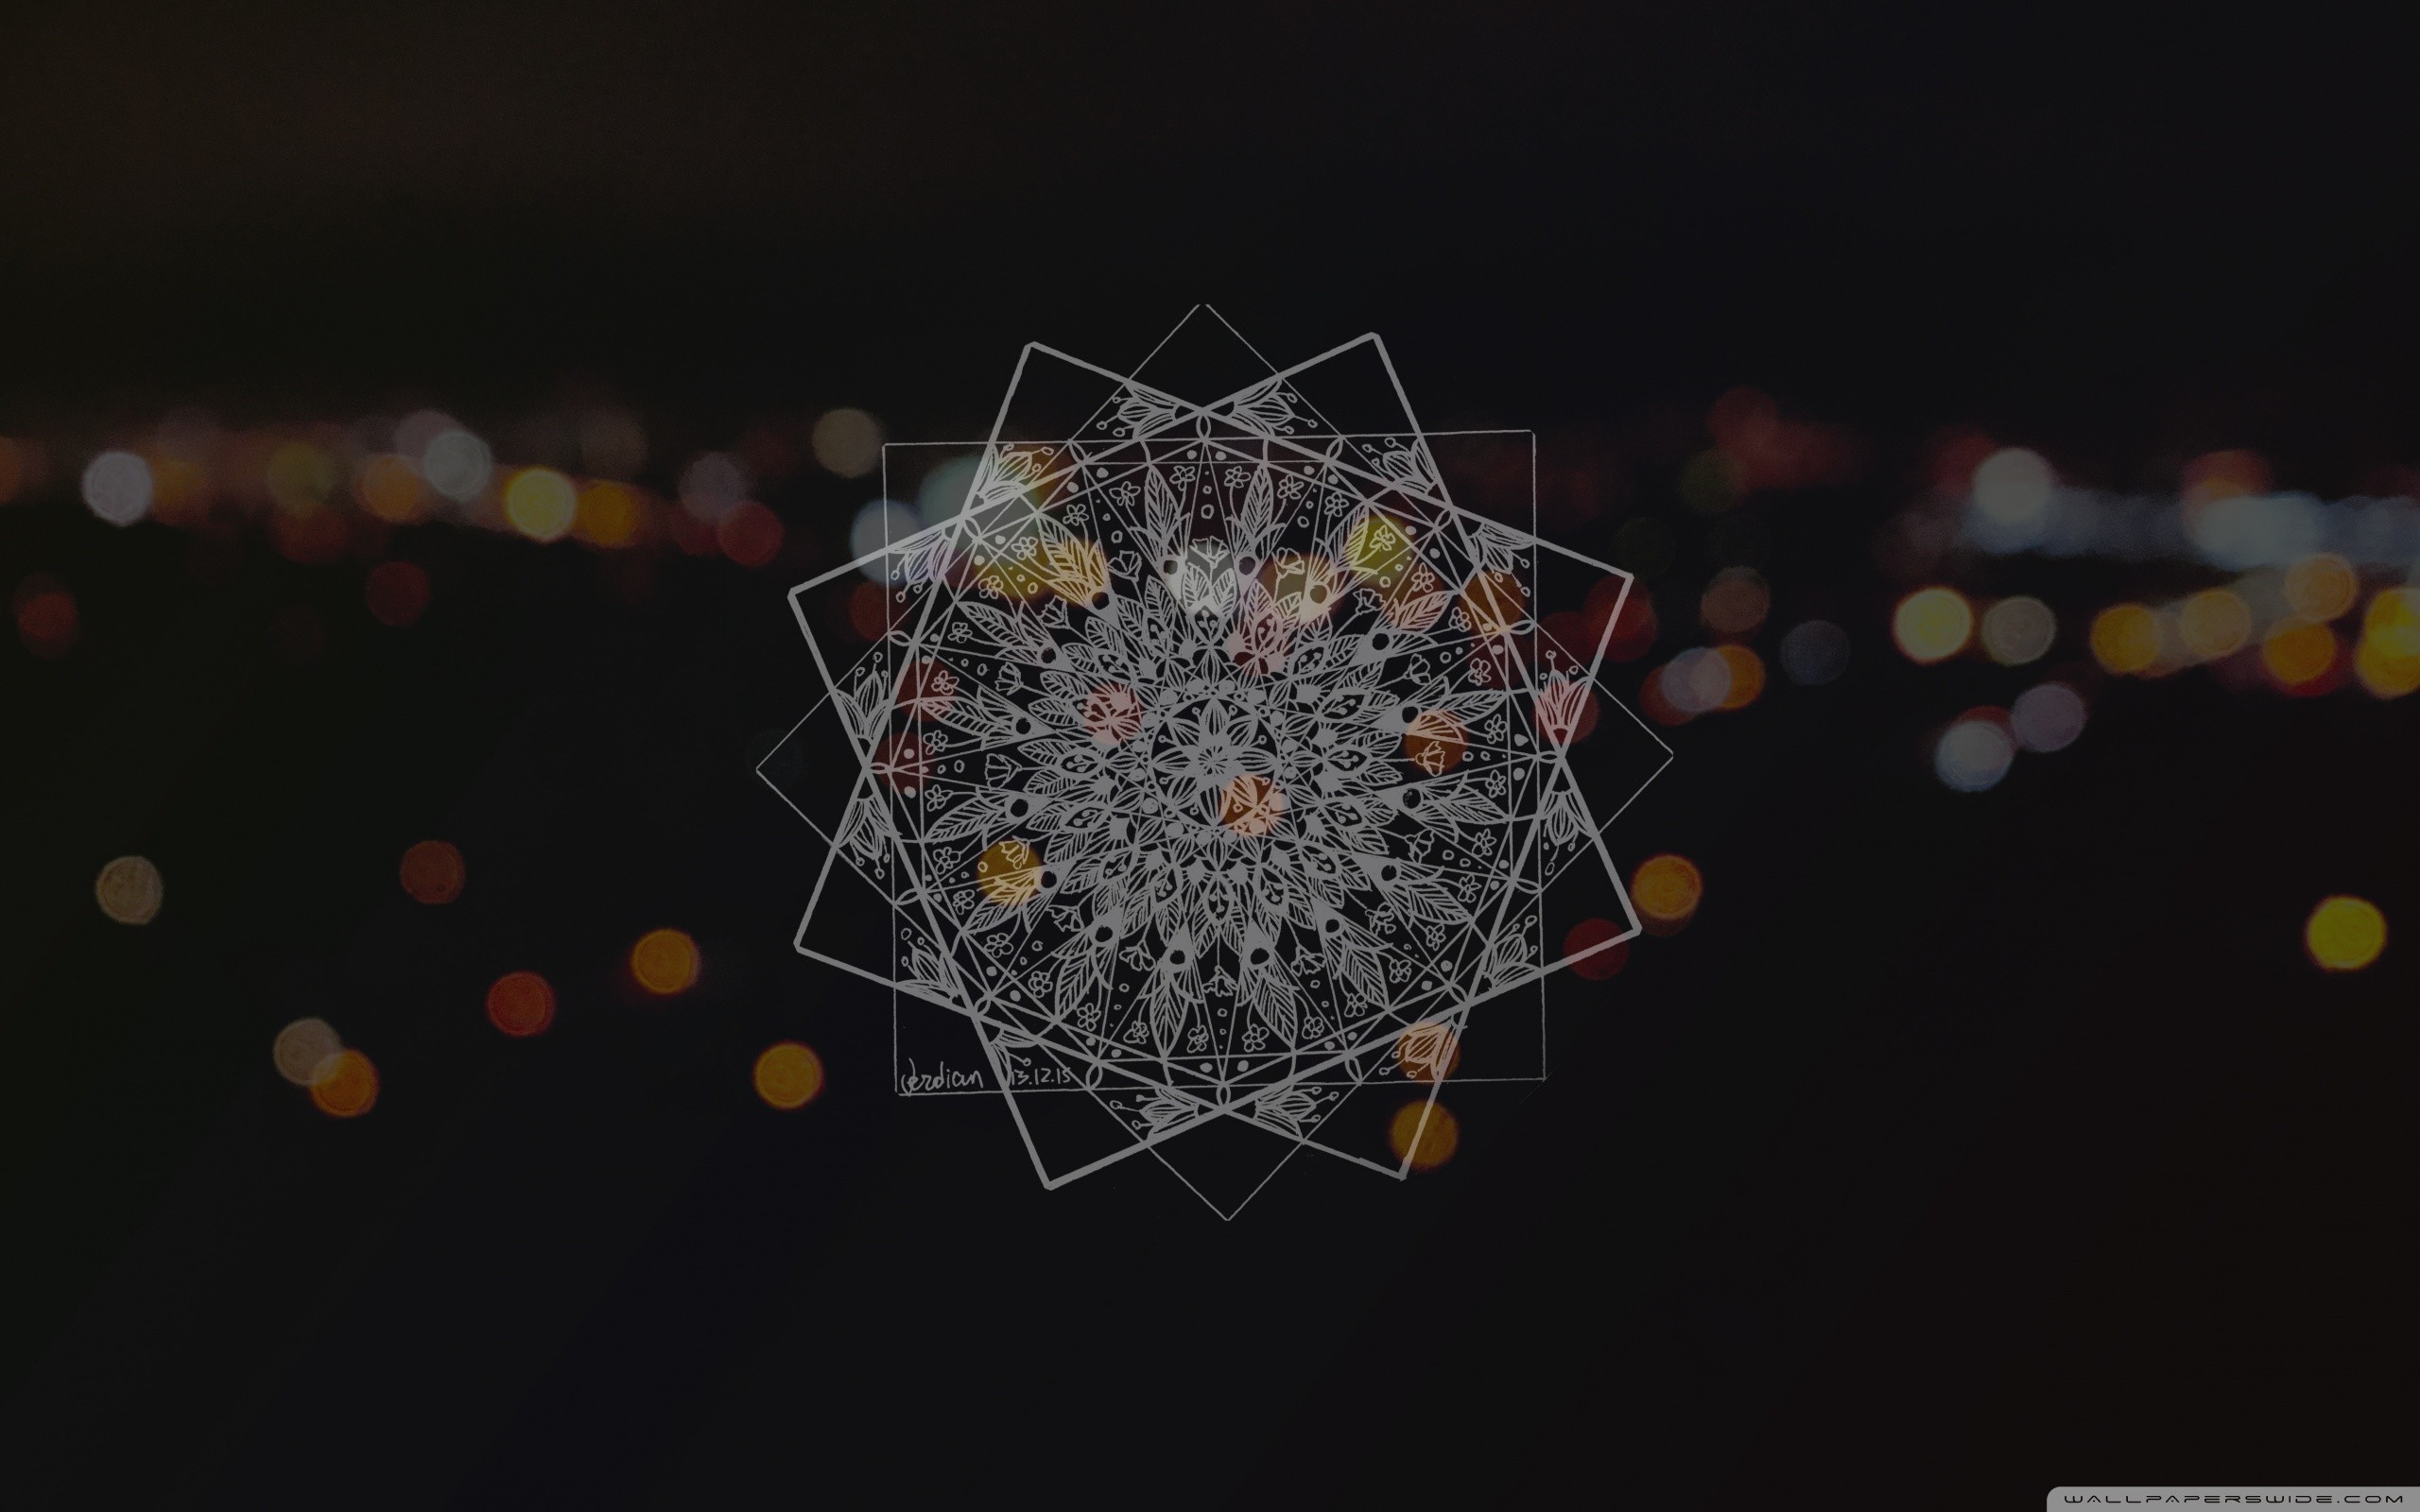 Mandala wallpaper ·① Download free amazing High Resolution ...